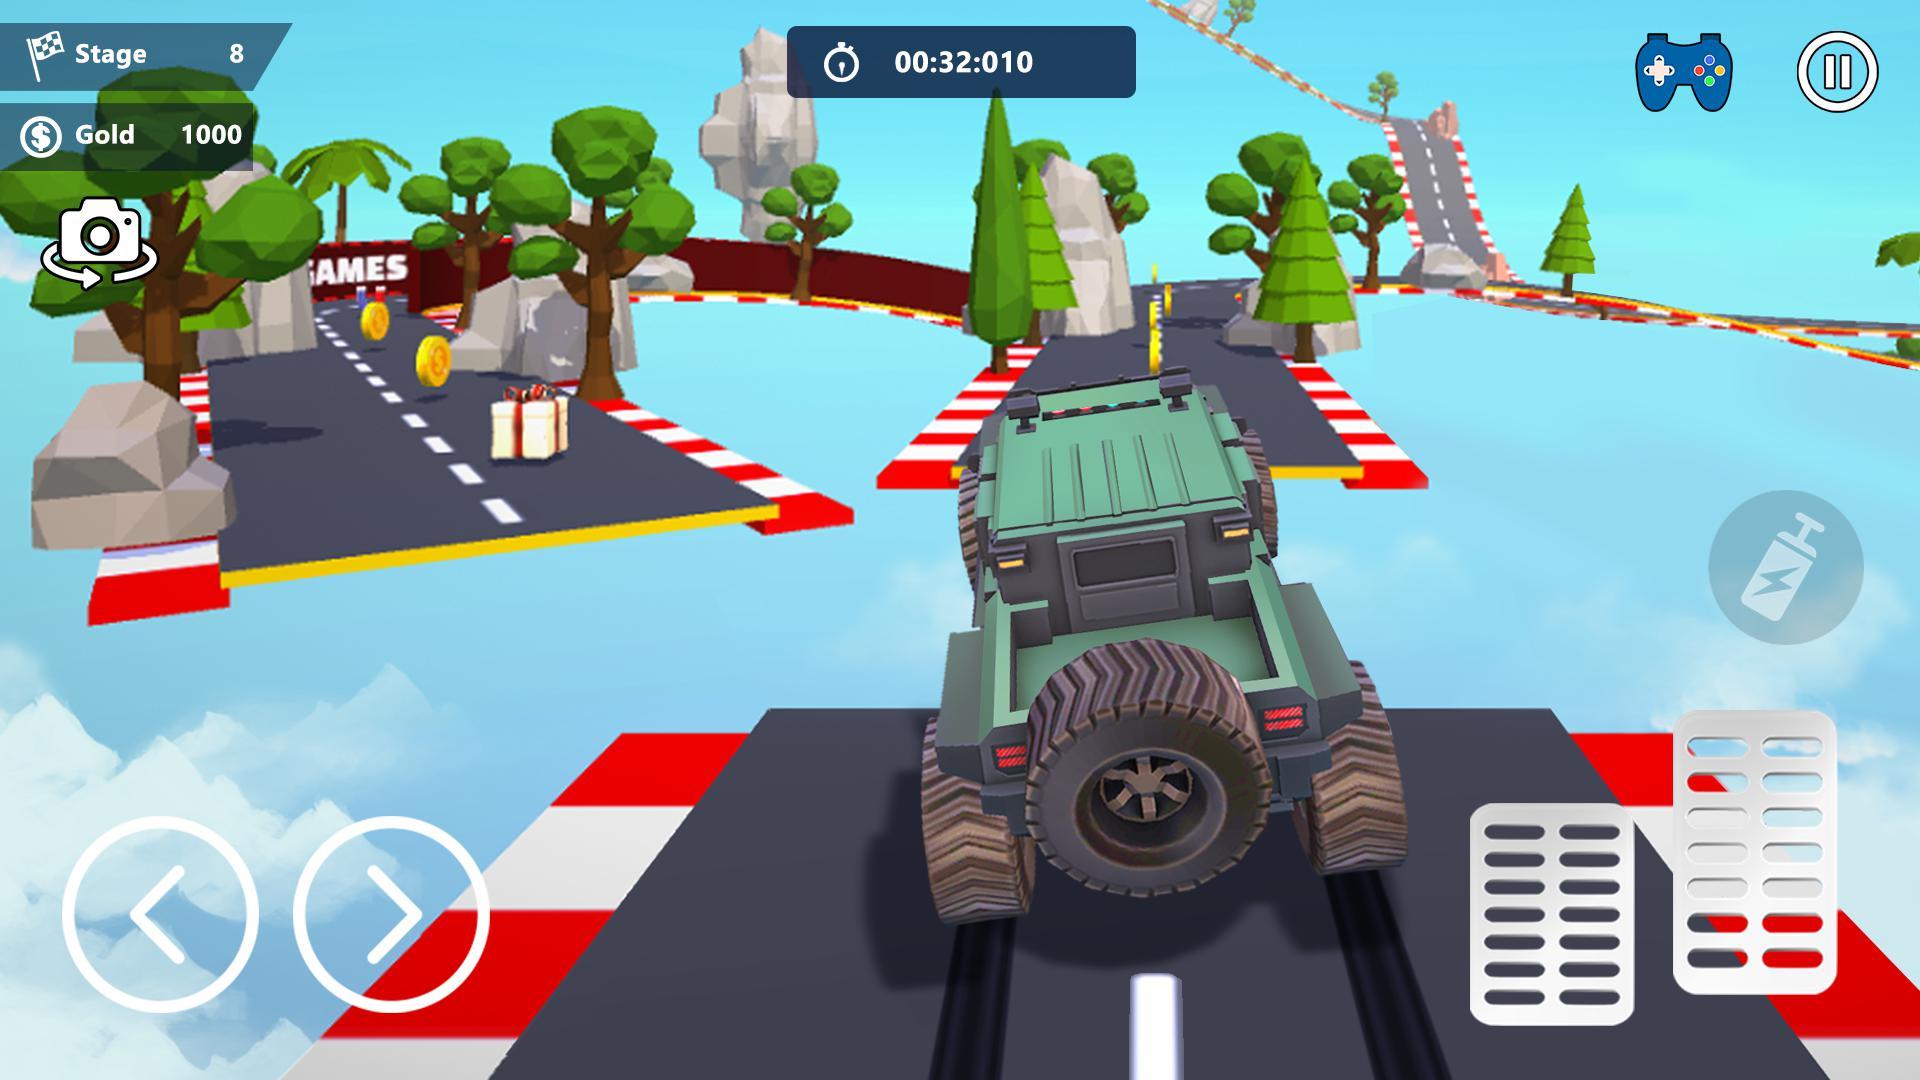 Car Stunts 3D Free - Extreme City GT Racing 游戏截图3